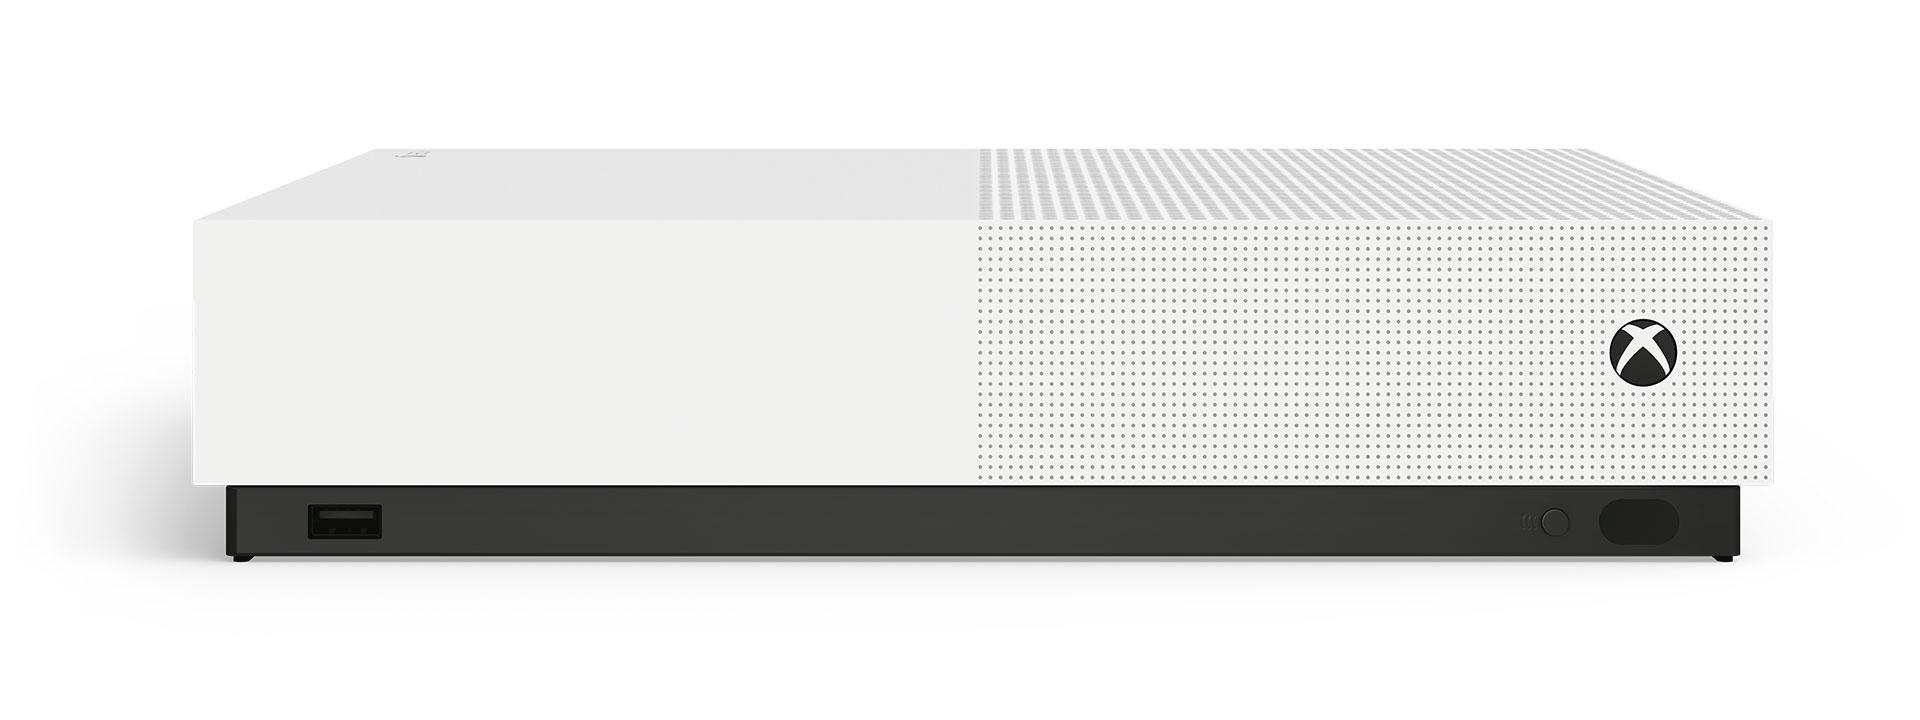 Xbox One S All-Digital  SAD